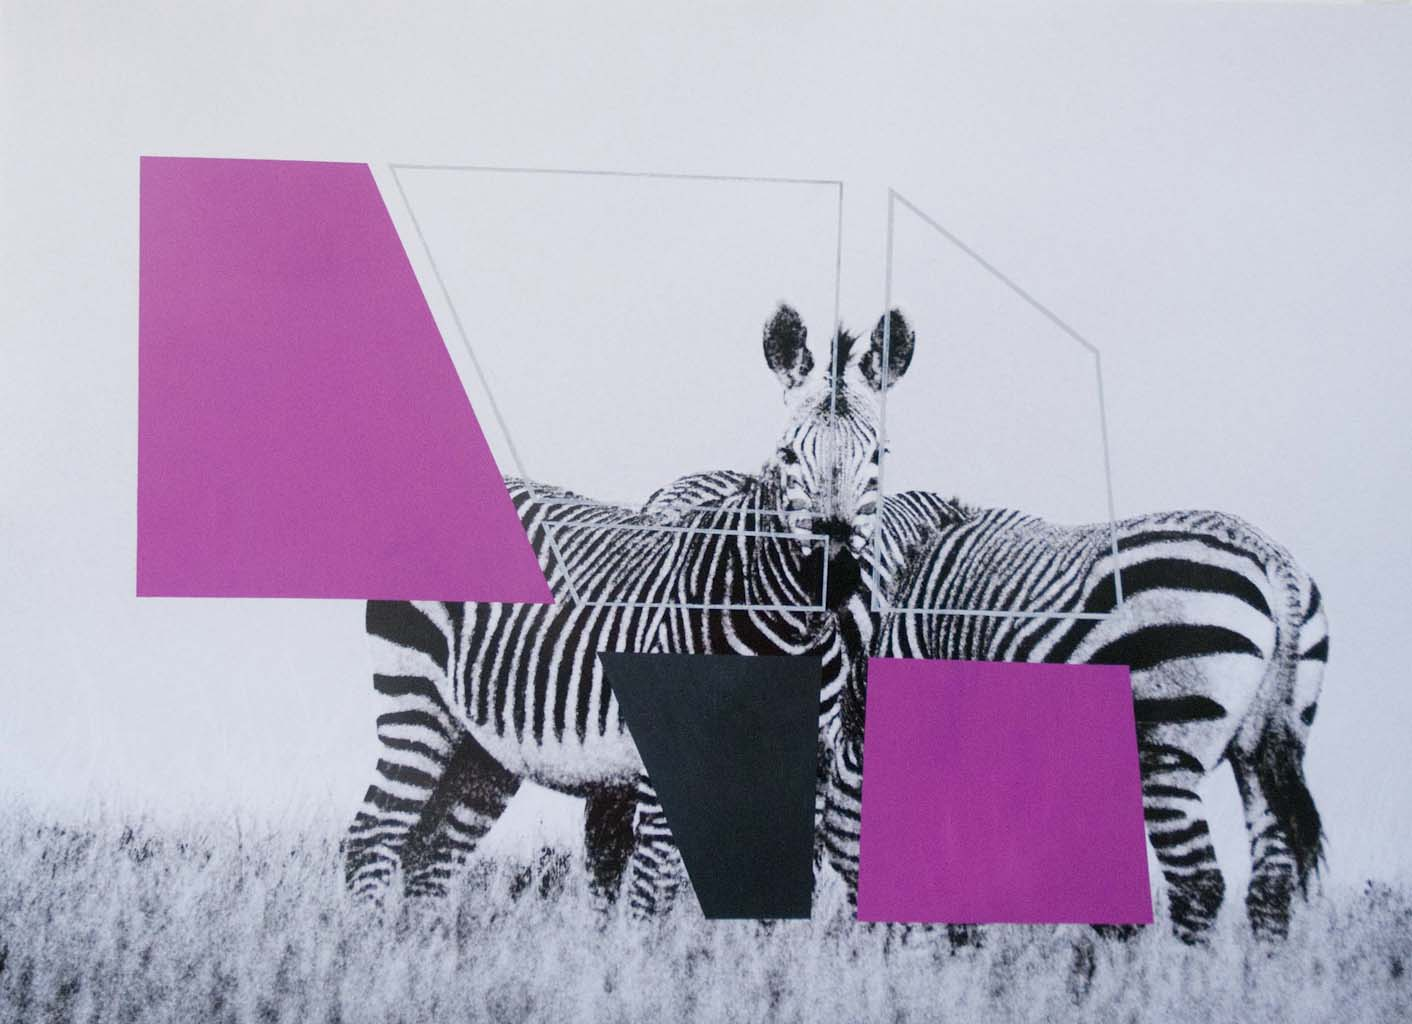 Mercedes Viegas Arte Contemporânea recebe individual de Alice Quaresma